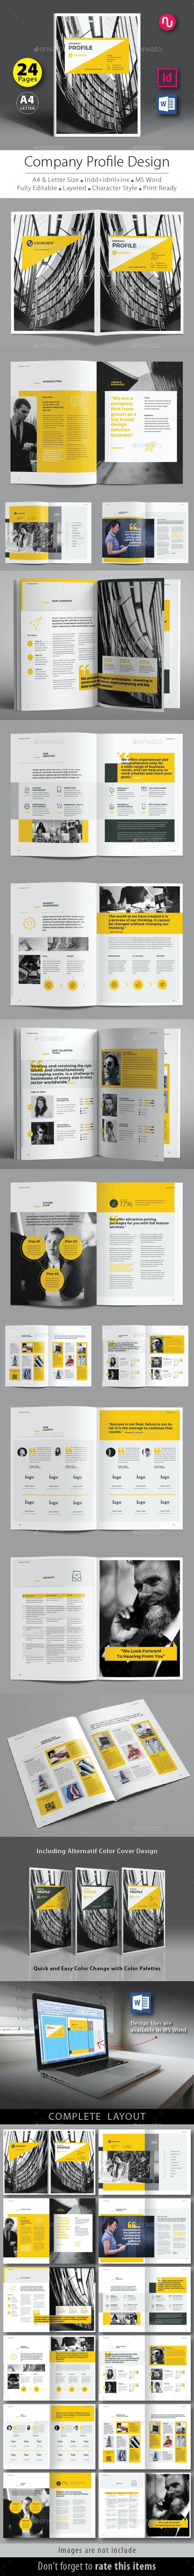 Marlakk Compro V.8 - Corporate Brochures